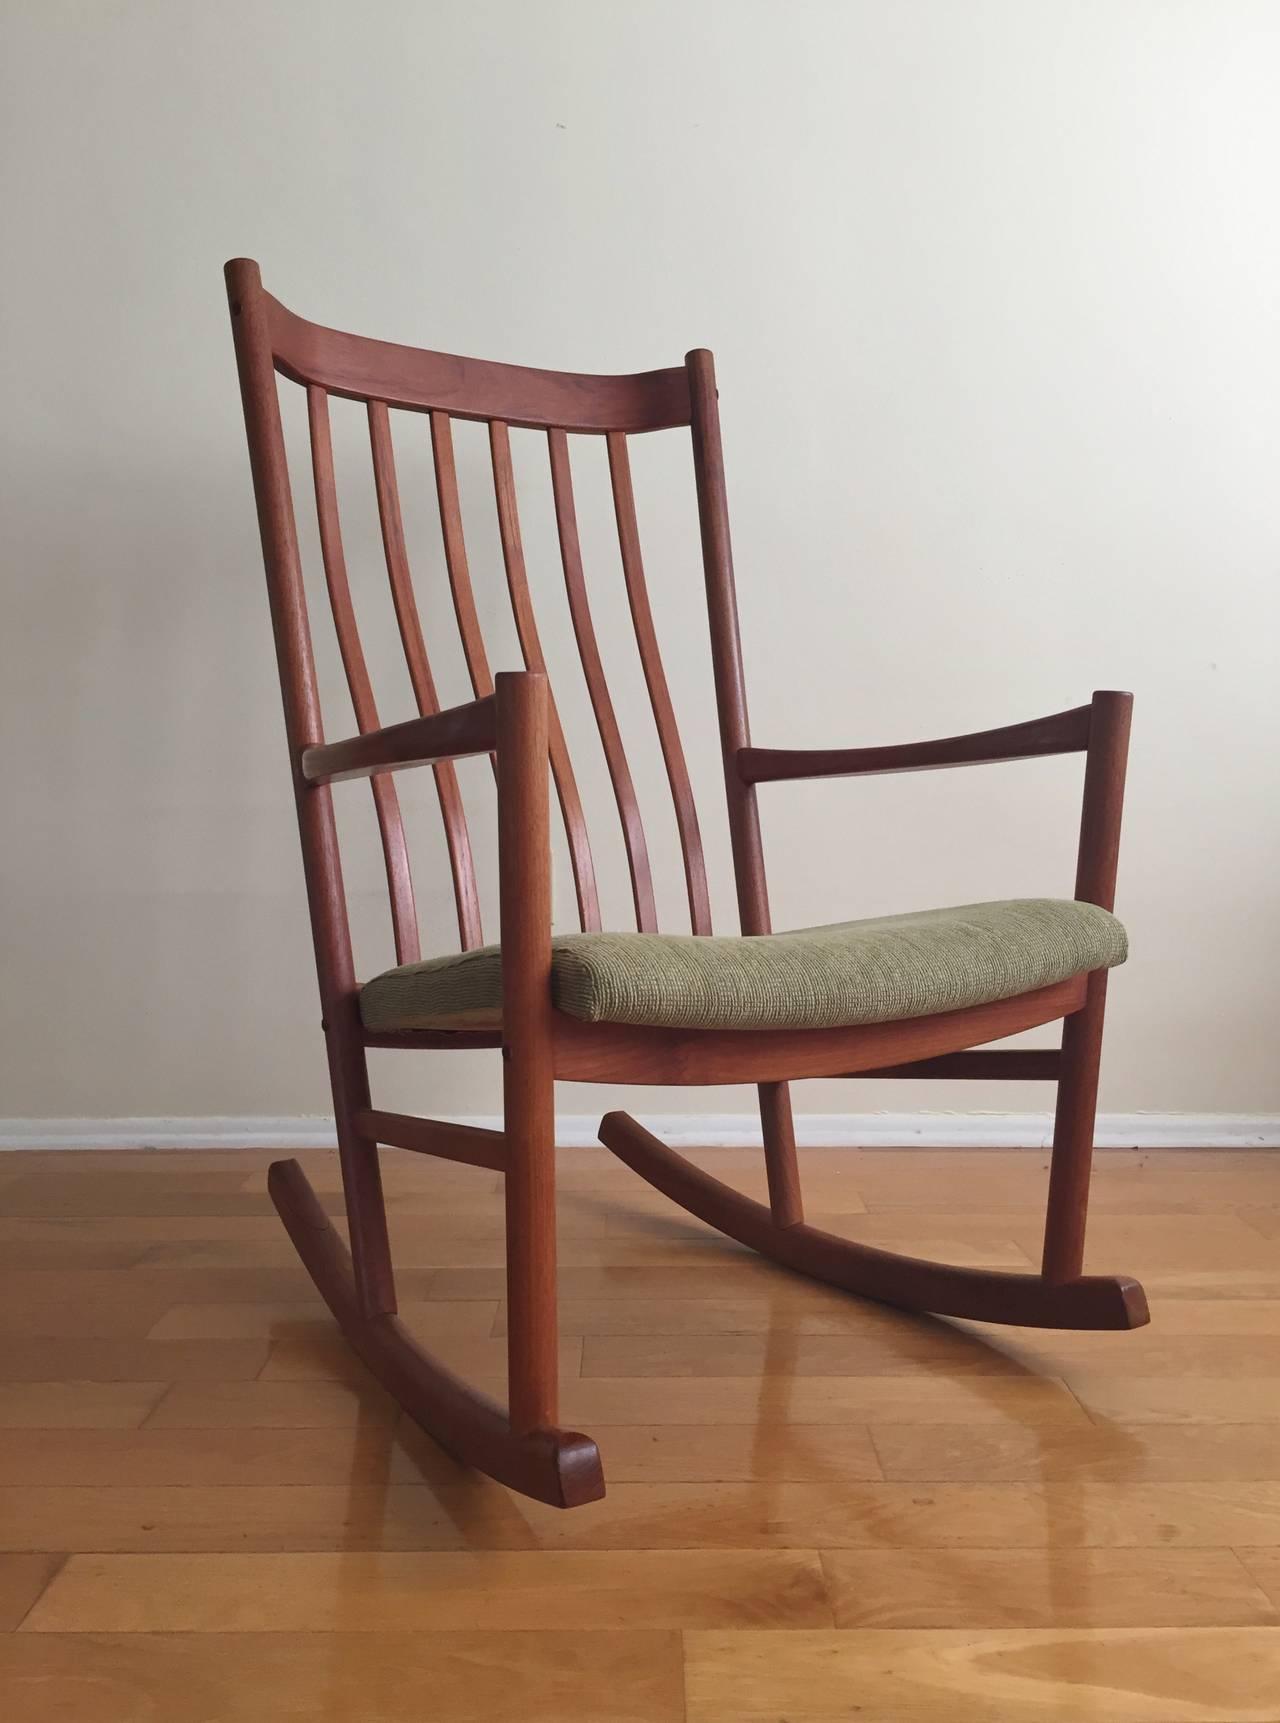 This Hans Wegner Teak Rocking Chair is no longer available.